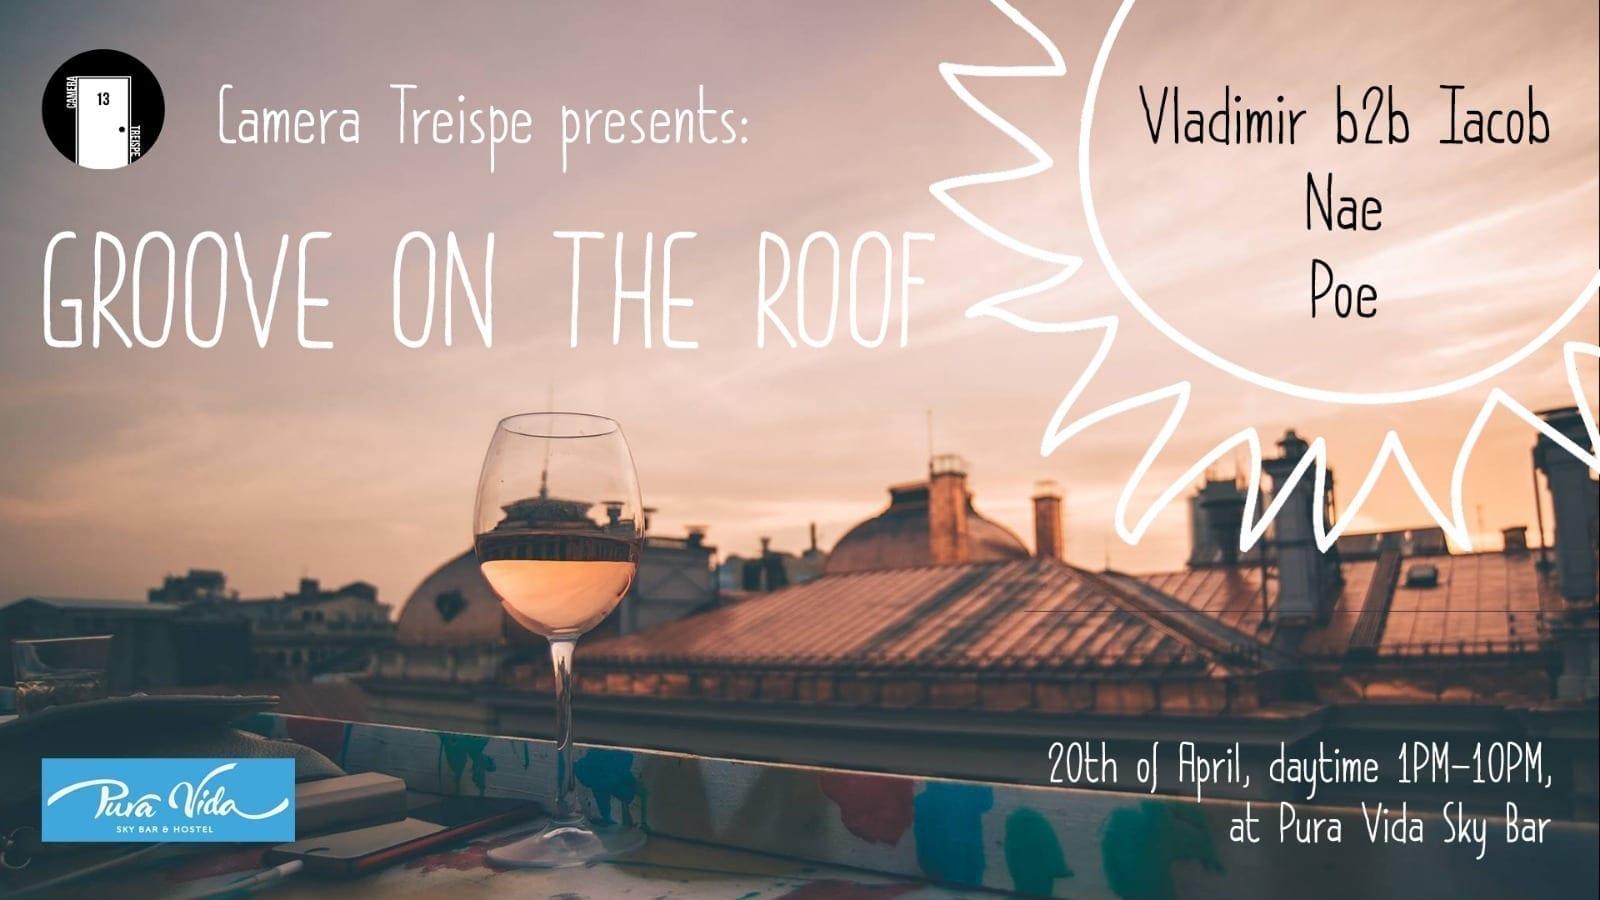 Groove on the roof w/ Vladimir b2b Iacob, Nae, Poe @ Pura Vida Sky Bar